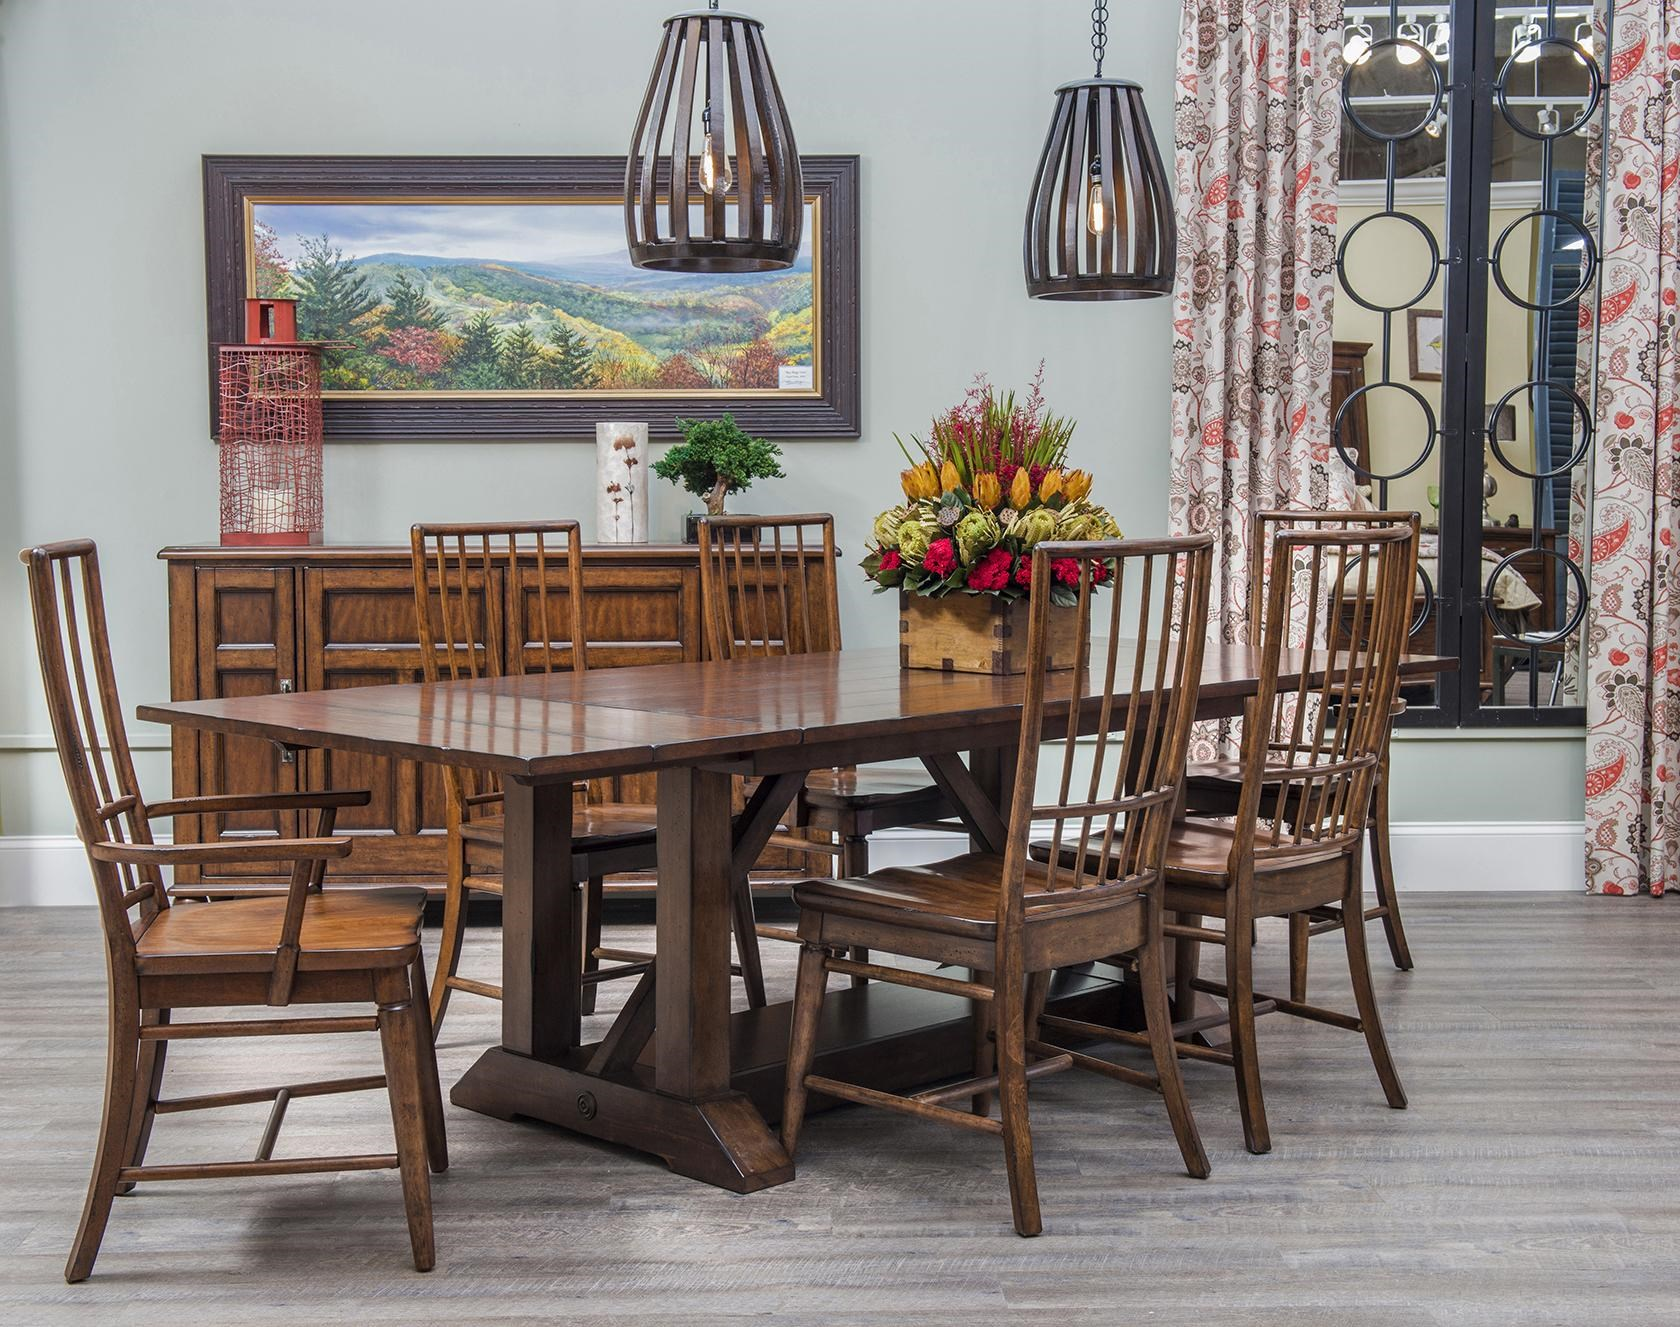 Superbe Blue Ridge Formal Dining Room Group By Carolina Preserves By Klaussner